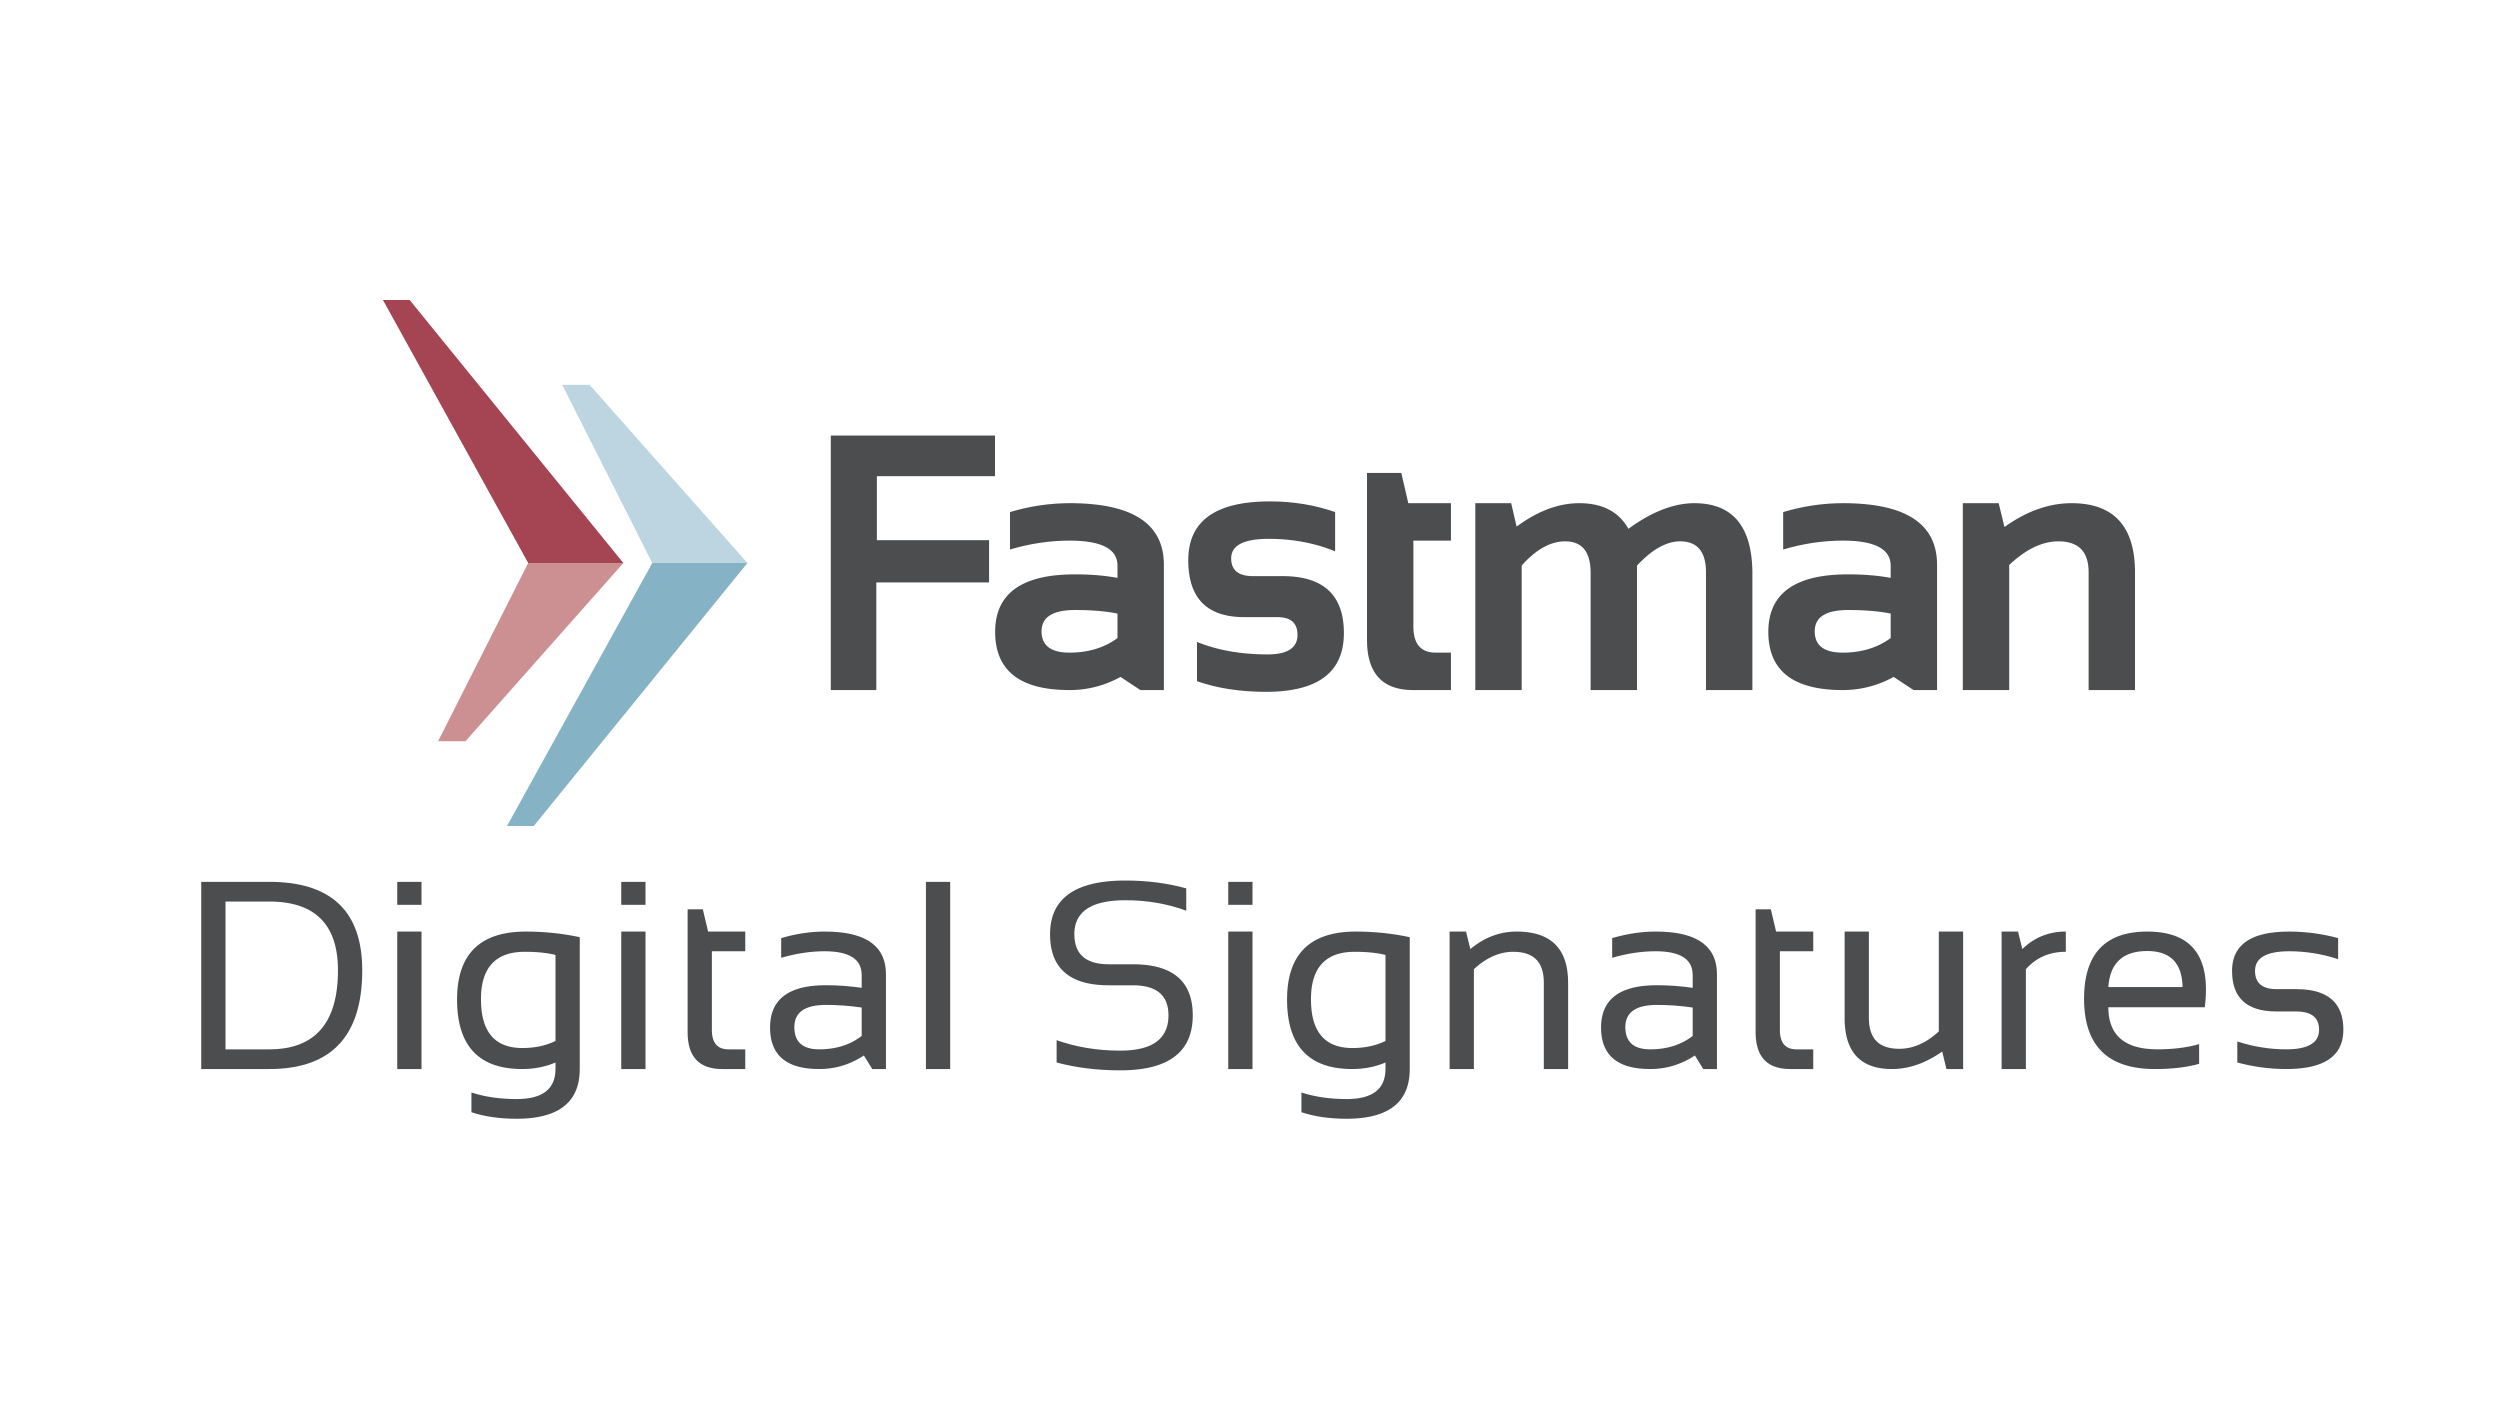 Fastman Digital Signatures